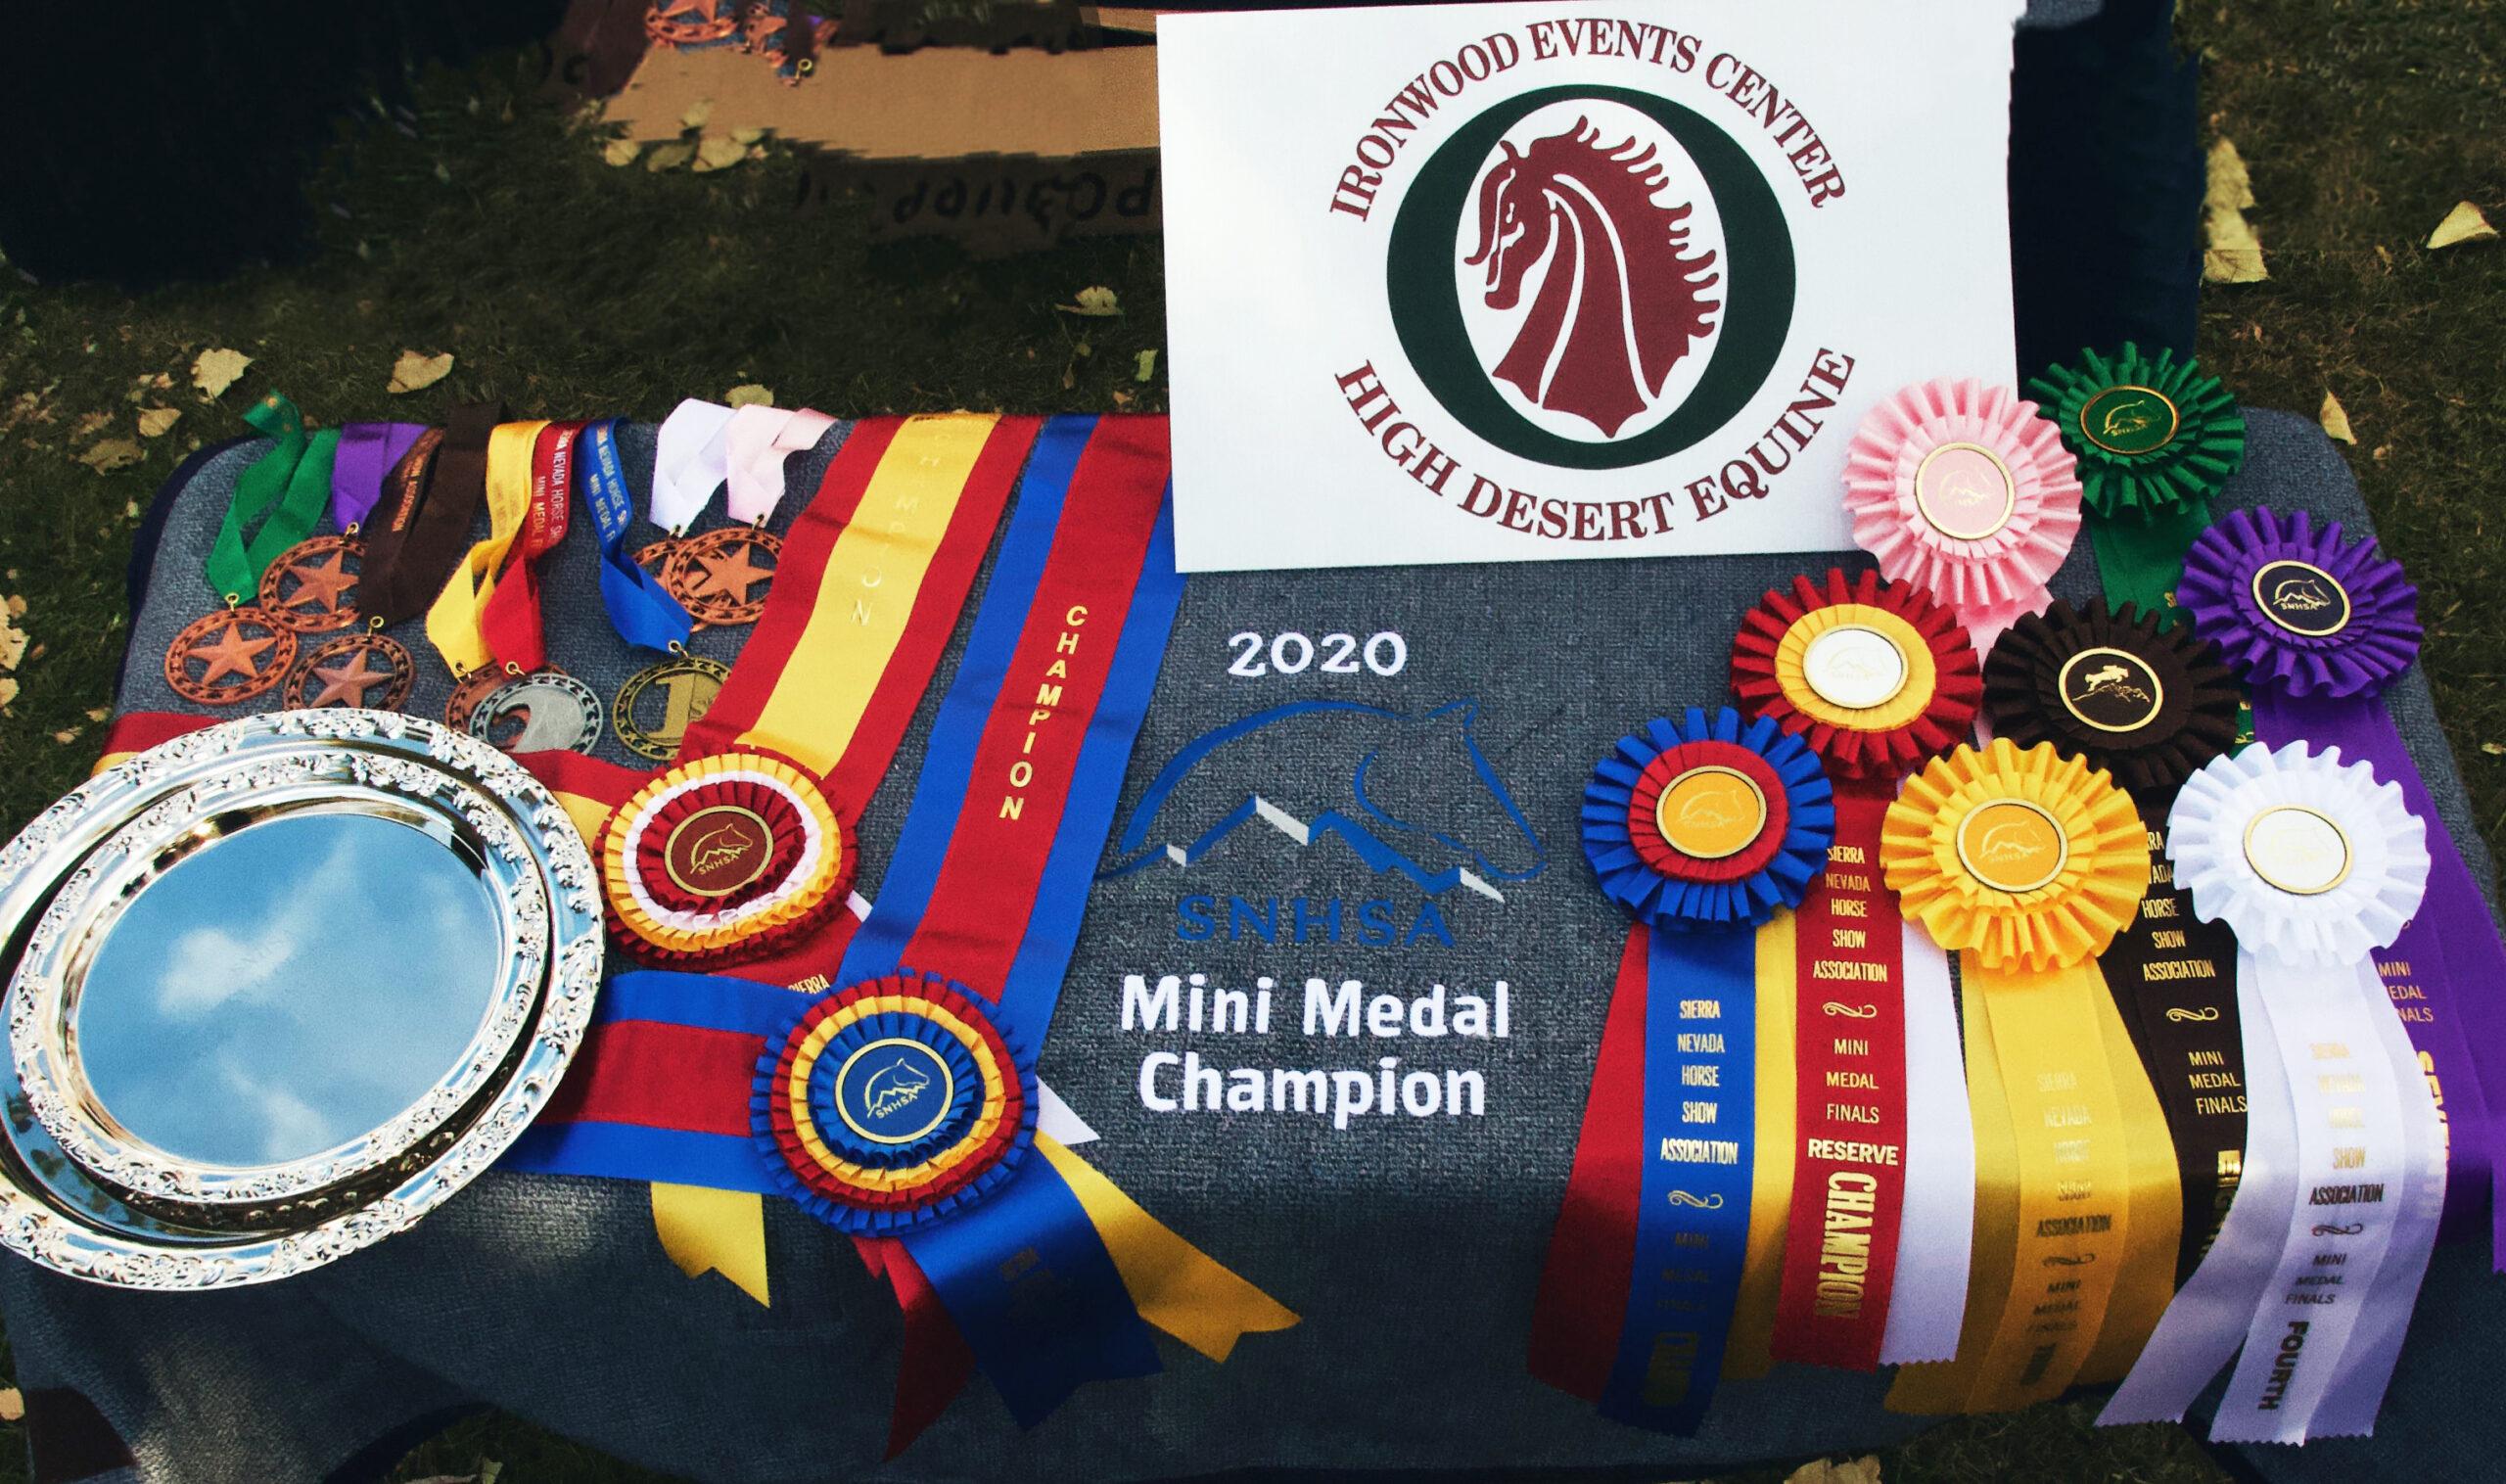 2020 Mini Medal awards